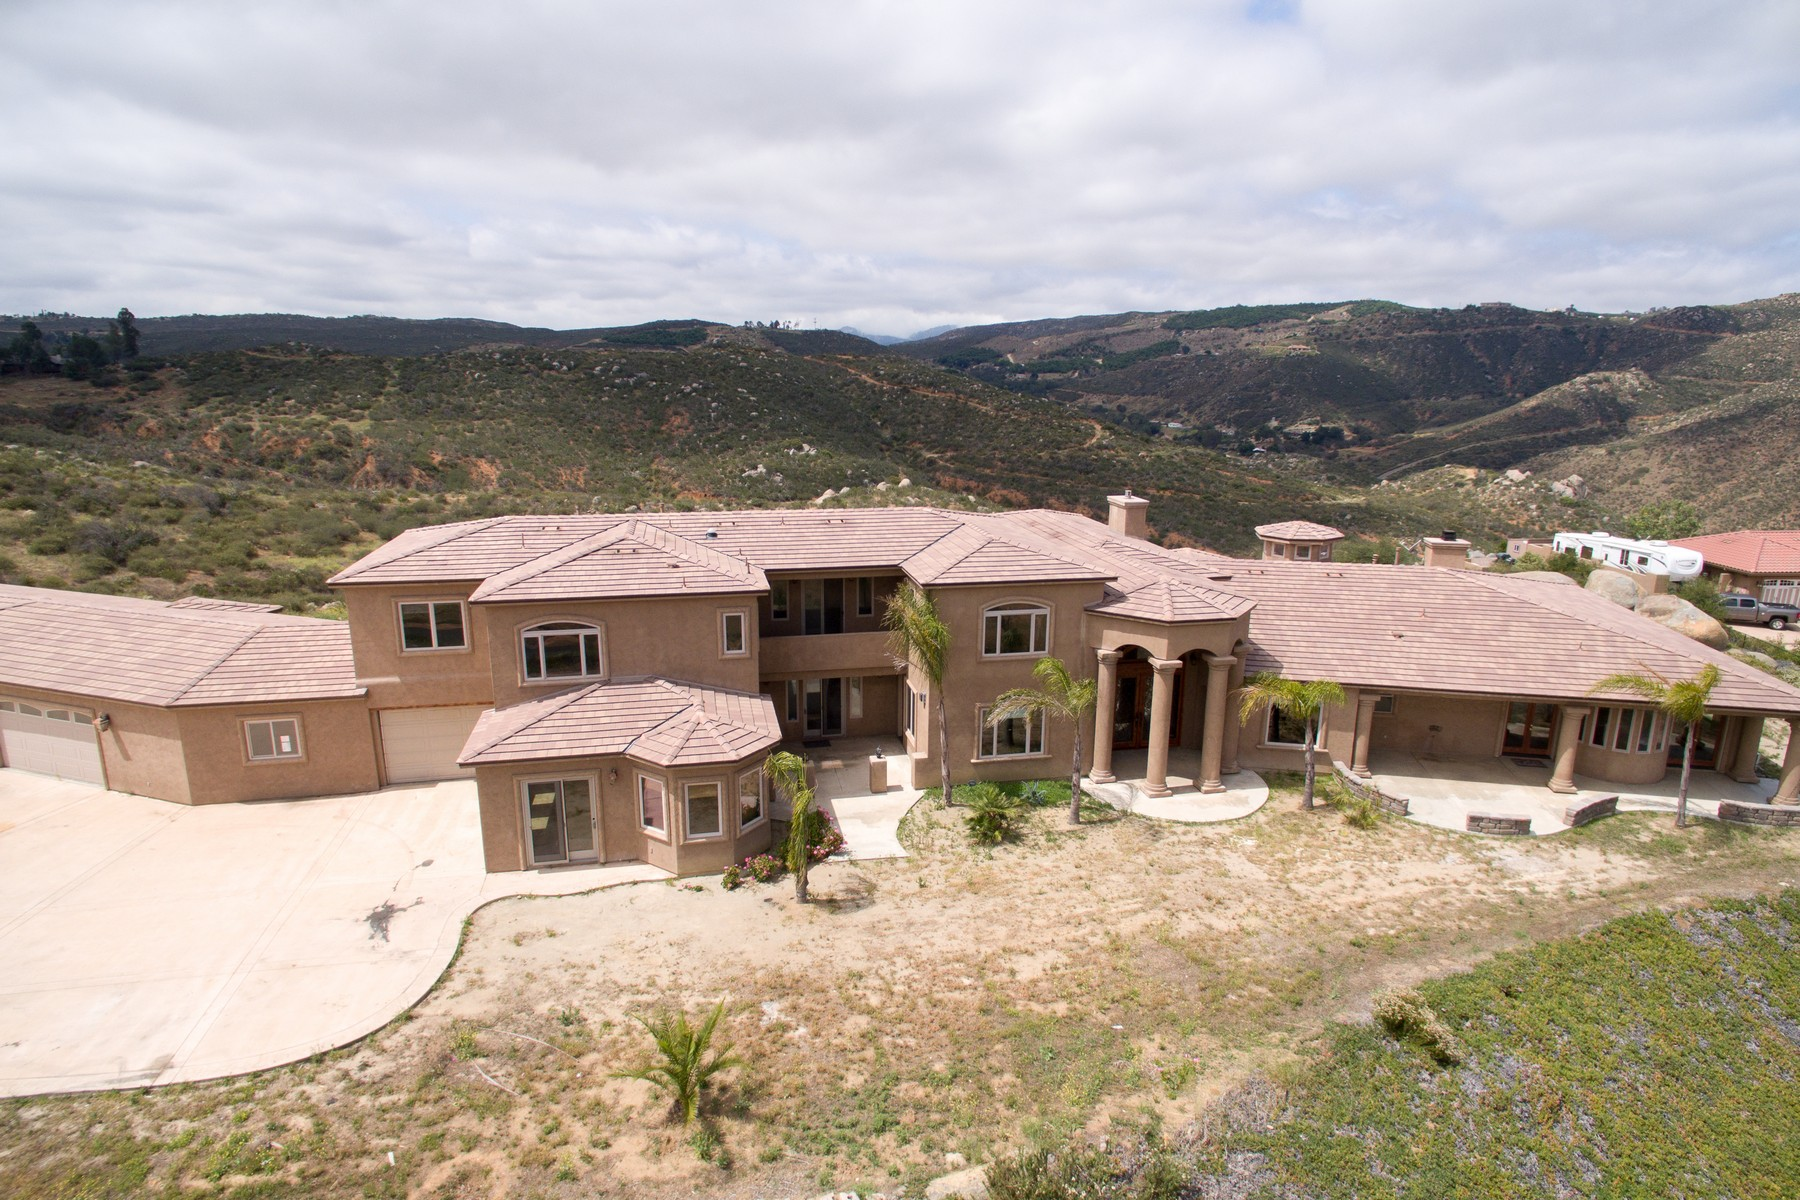 Single Family Home for Sale at 20516 Rancho Villa Road Ramona, California 92065 United States